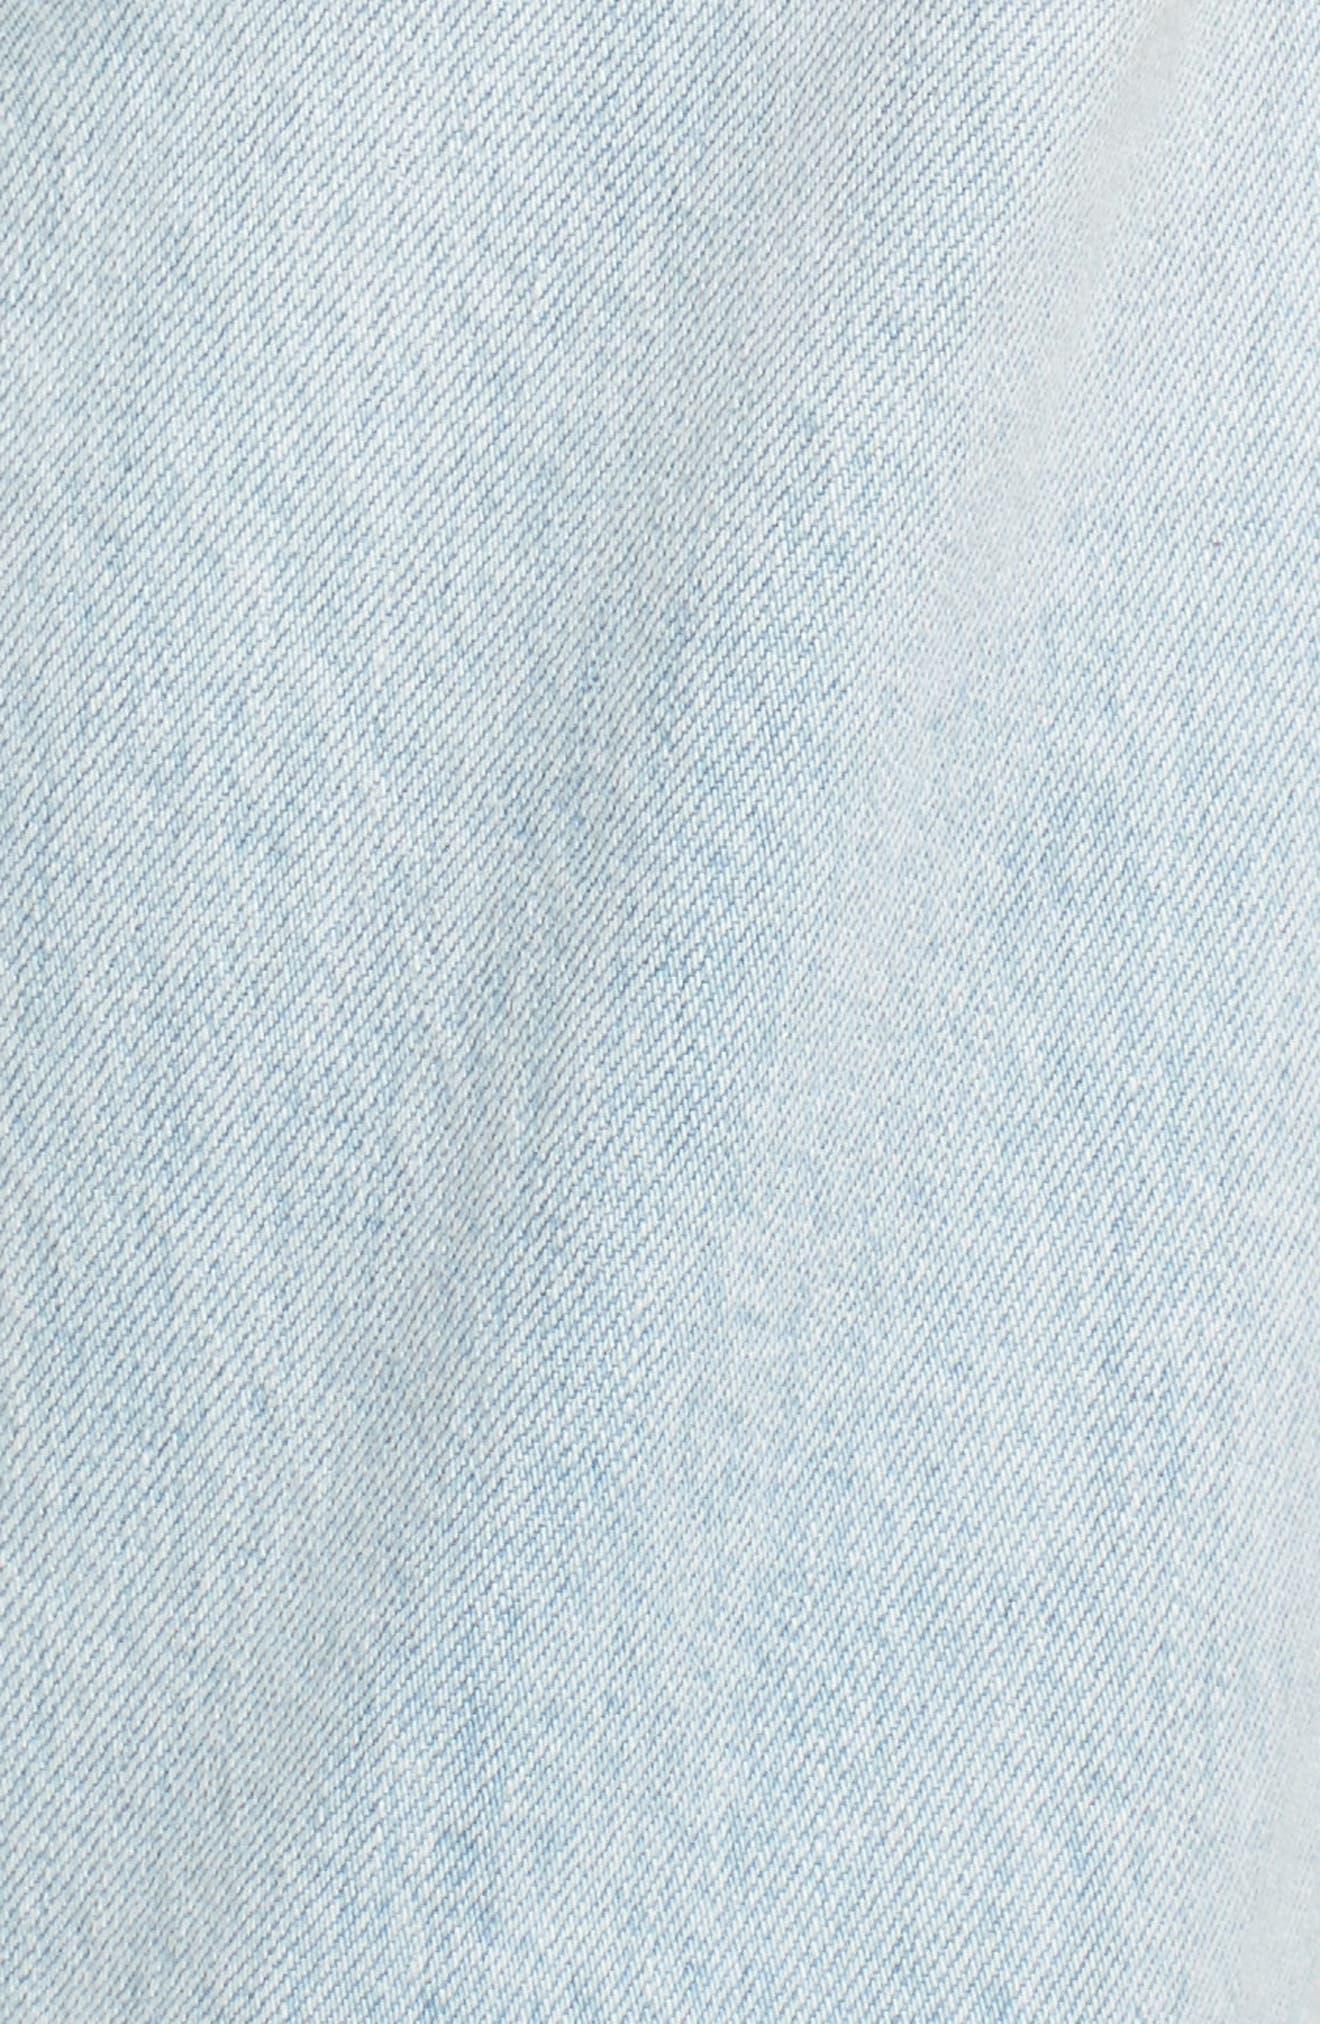 Good Straight Pearls High Waist Jeans,                             Alternate thumbnail 6, color,                             401